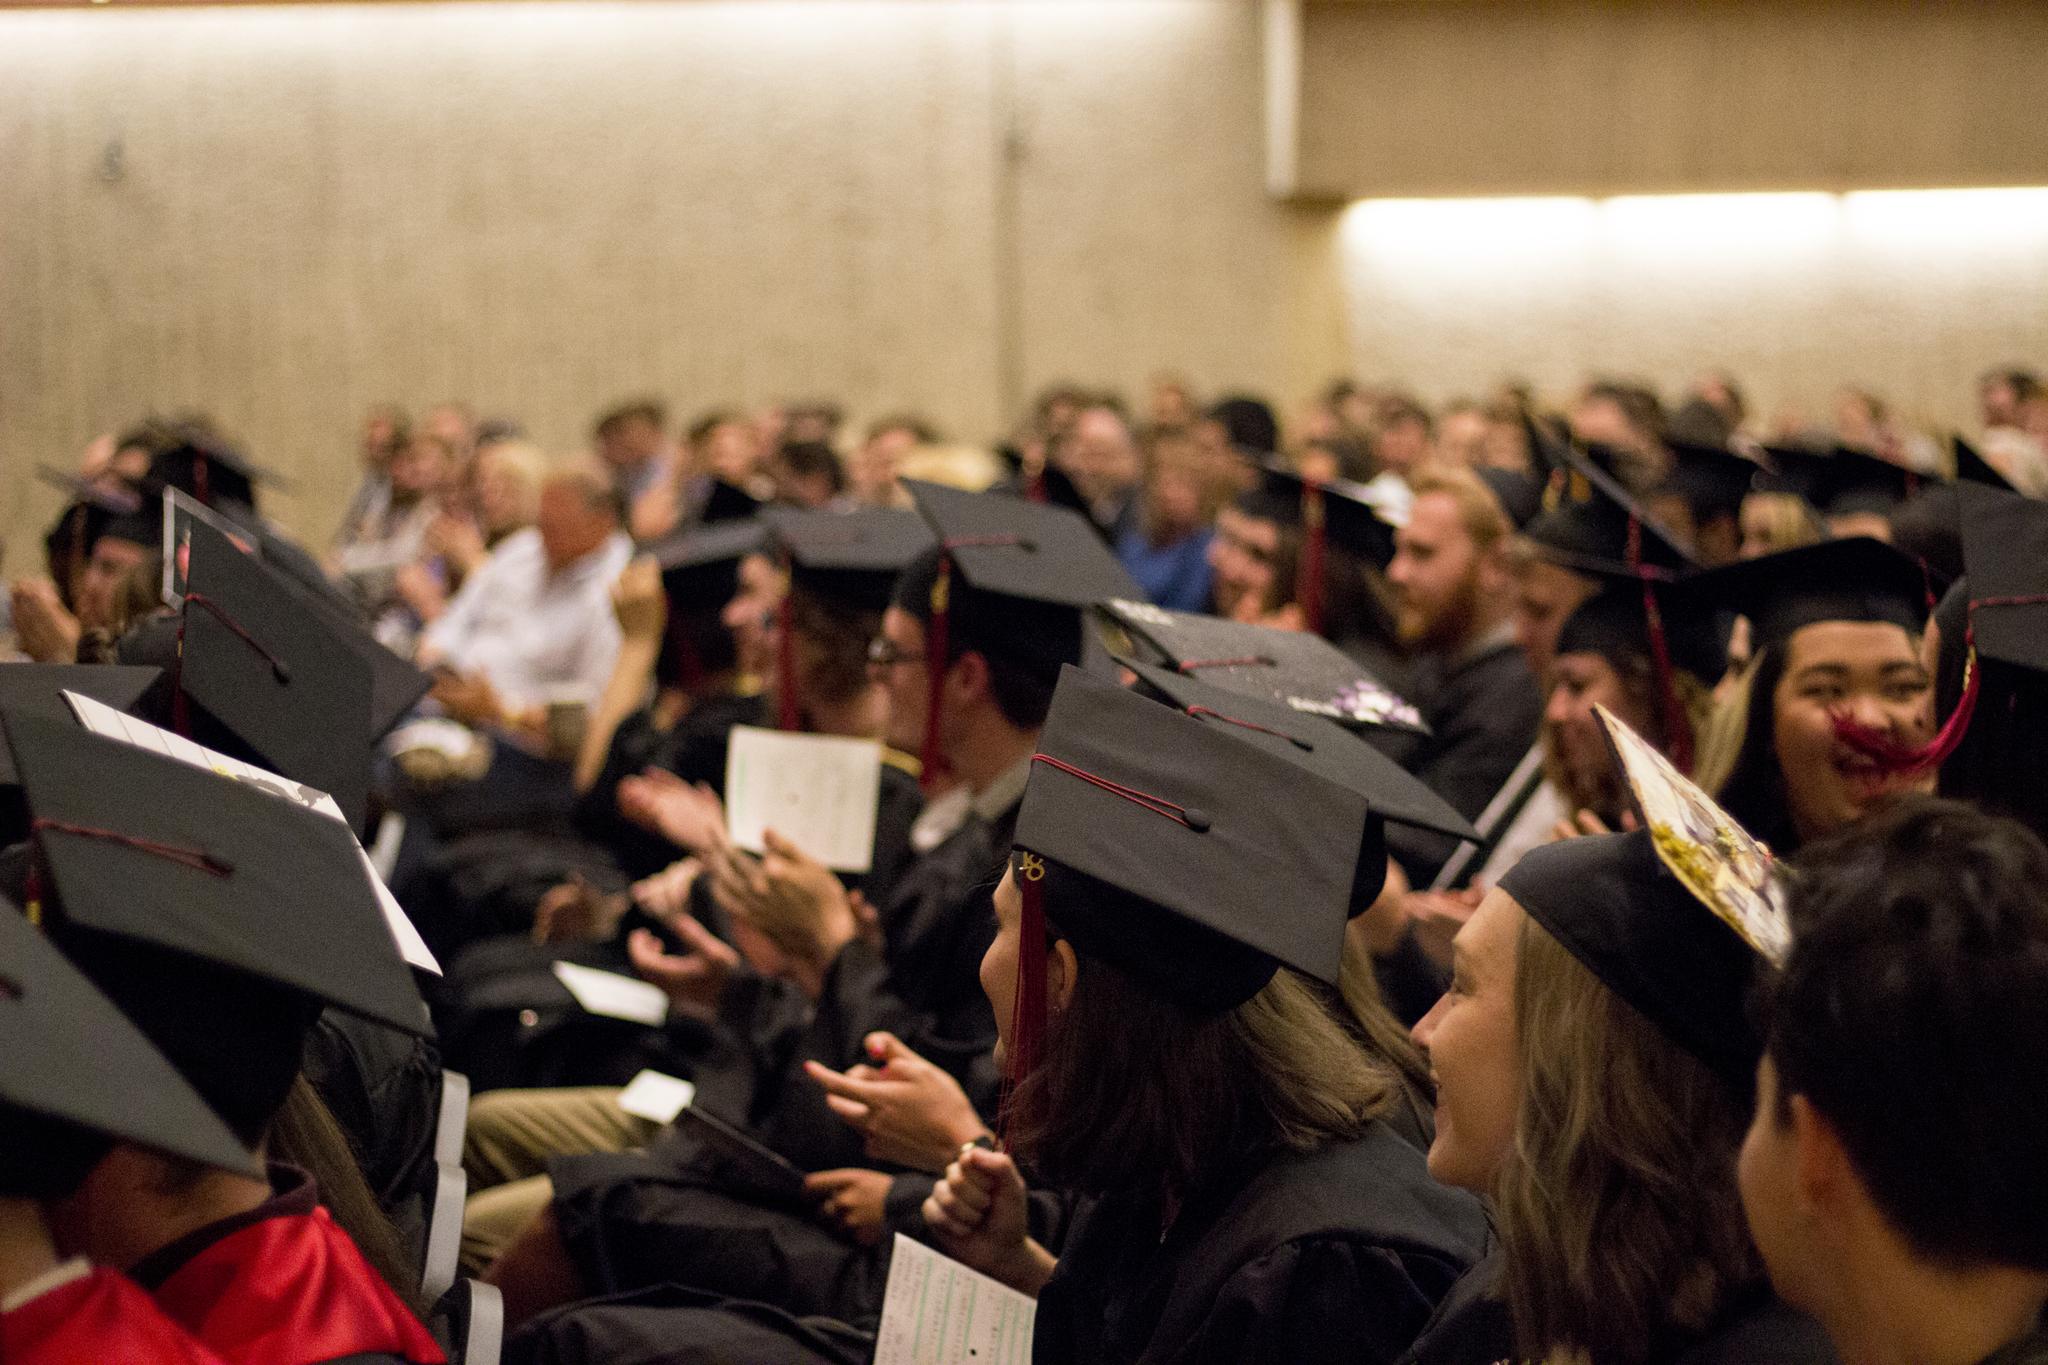 Students clapping at graduation